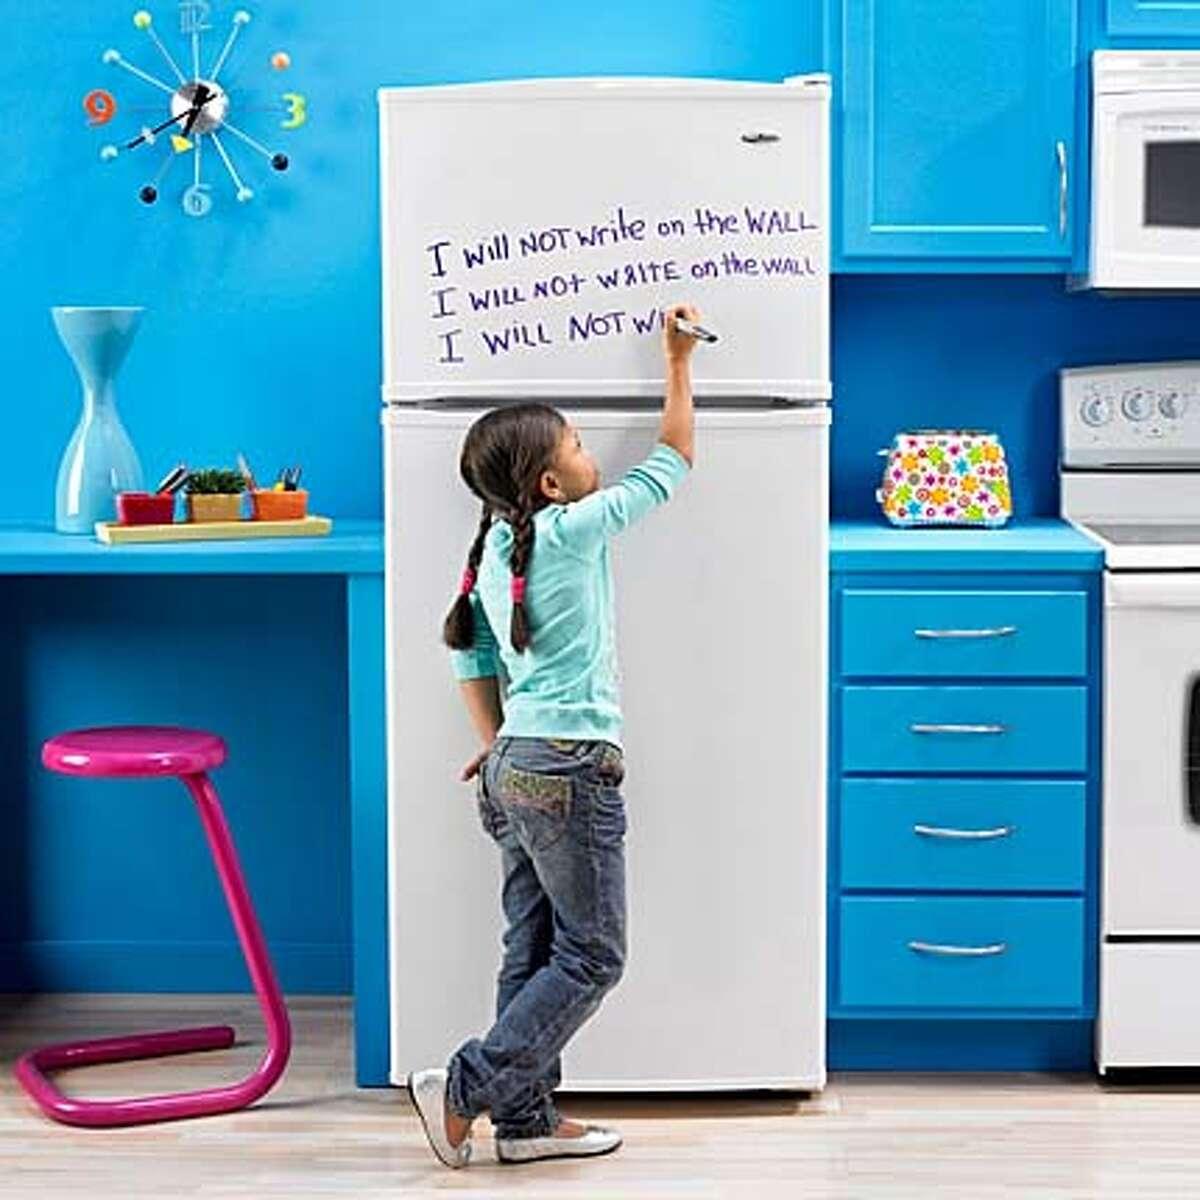 ###Live Caption:Amana's new Jot refrigerator P070564###Caption History:Amana's new Jot refrigerator P070564###Notes:###Special Instructions: